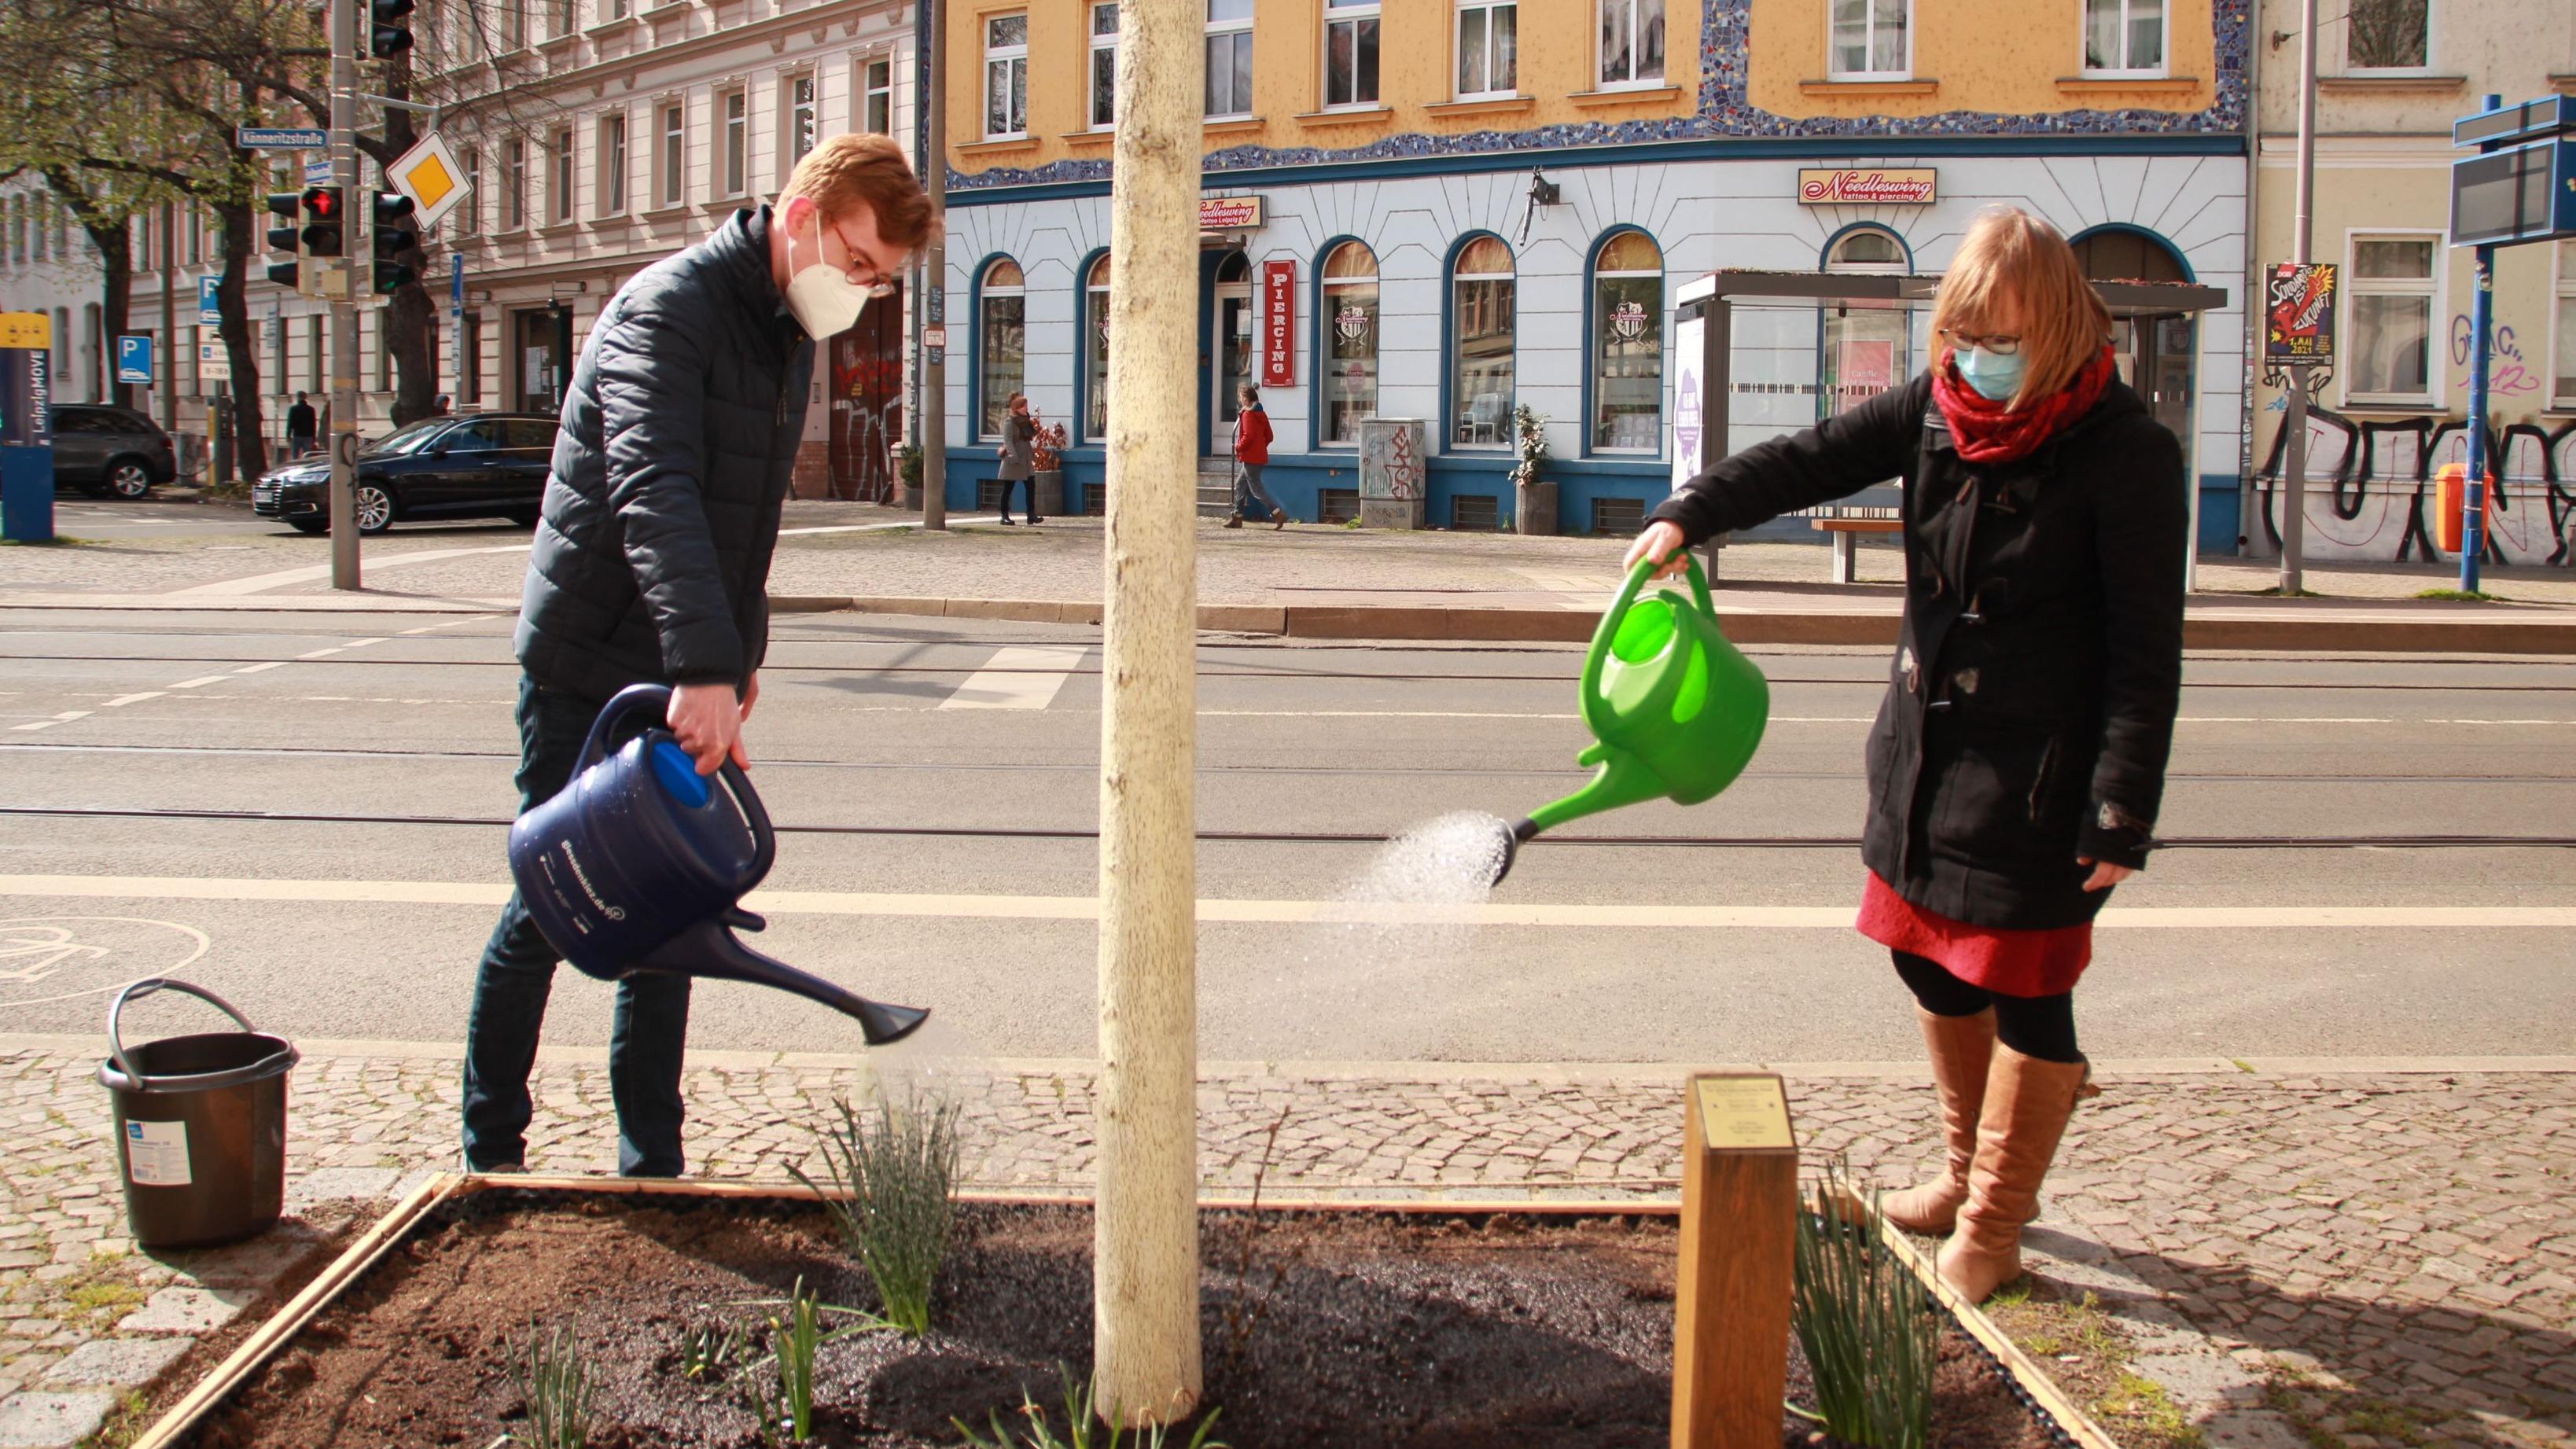 Quentin & Svea vom Team LEIPZIG GIESST | Foto: Raphaela Krumhard